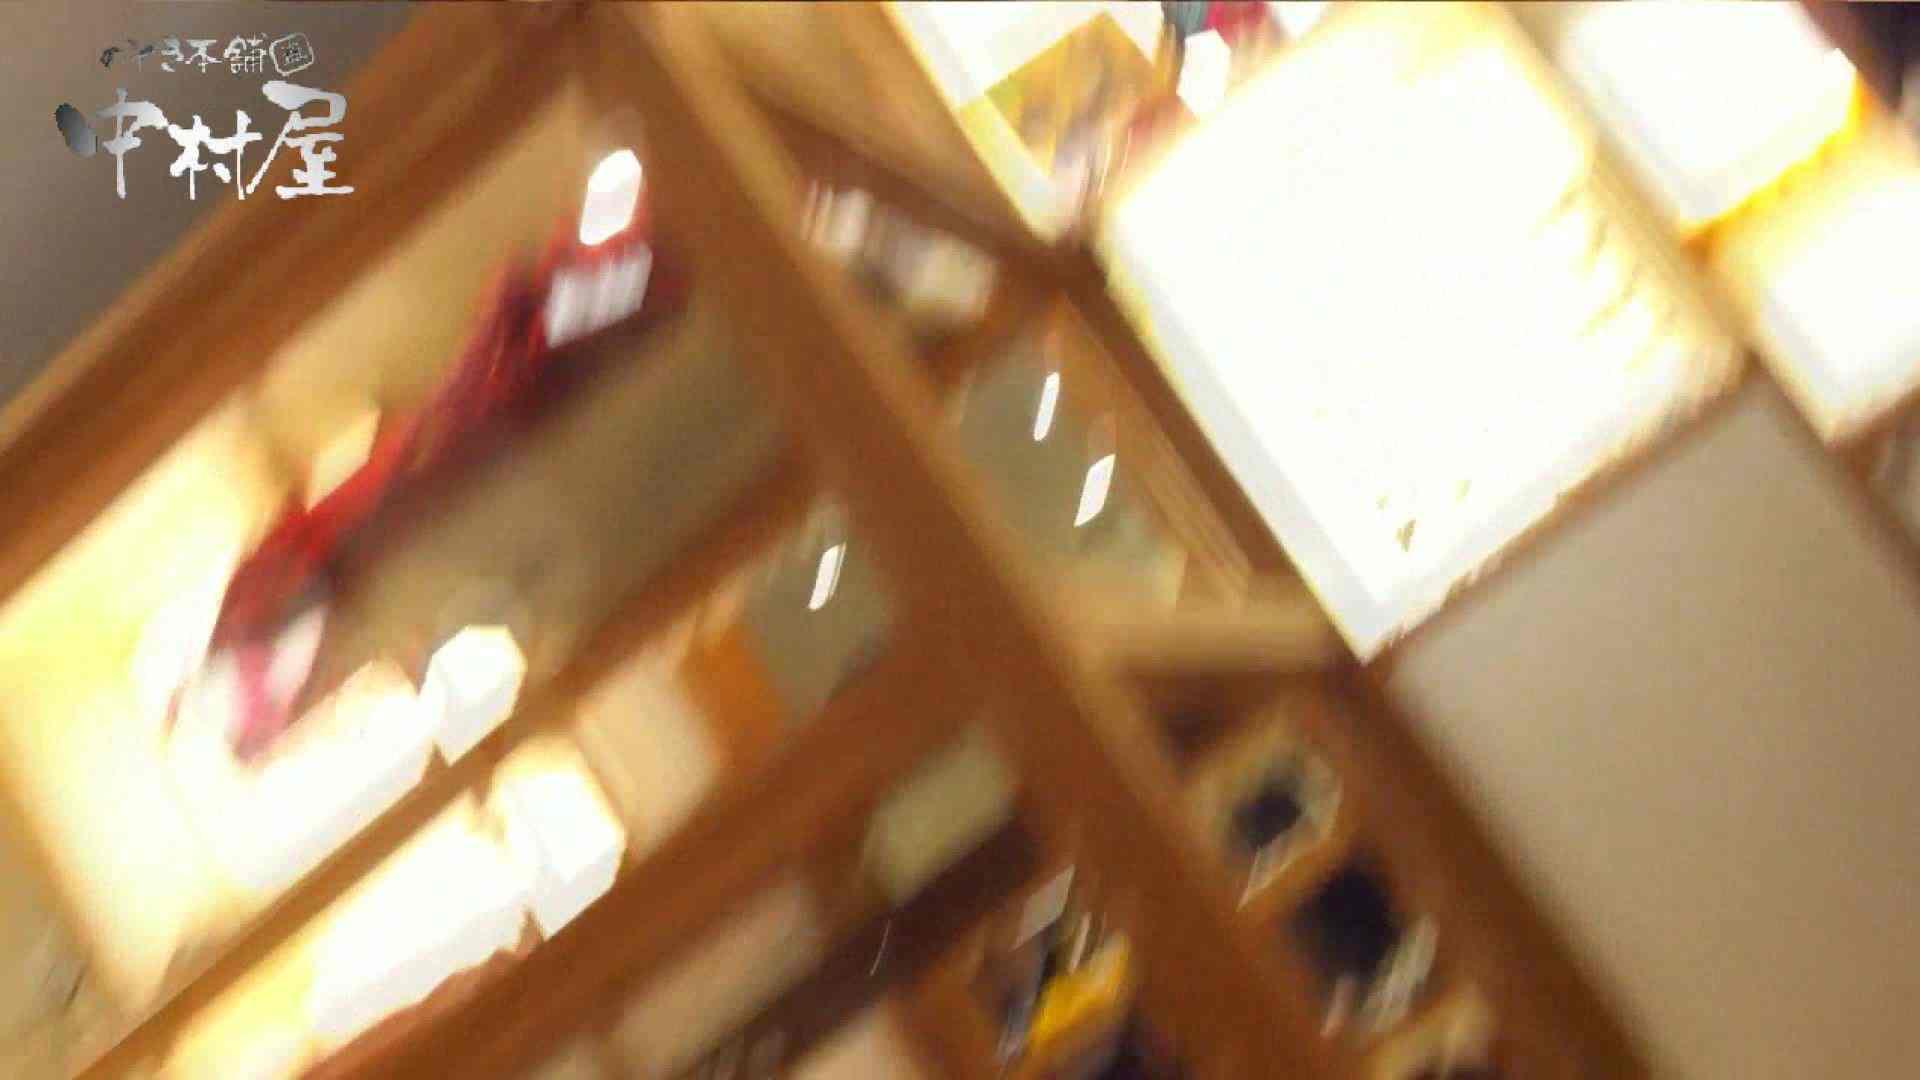 vol.65 美人アパレル胸チラ&パンチラ ムッチリ感がいい感じ花がらパンツさん チラ  106連発 35